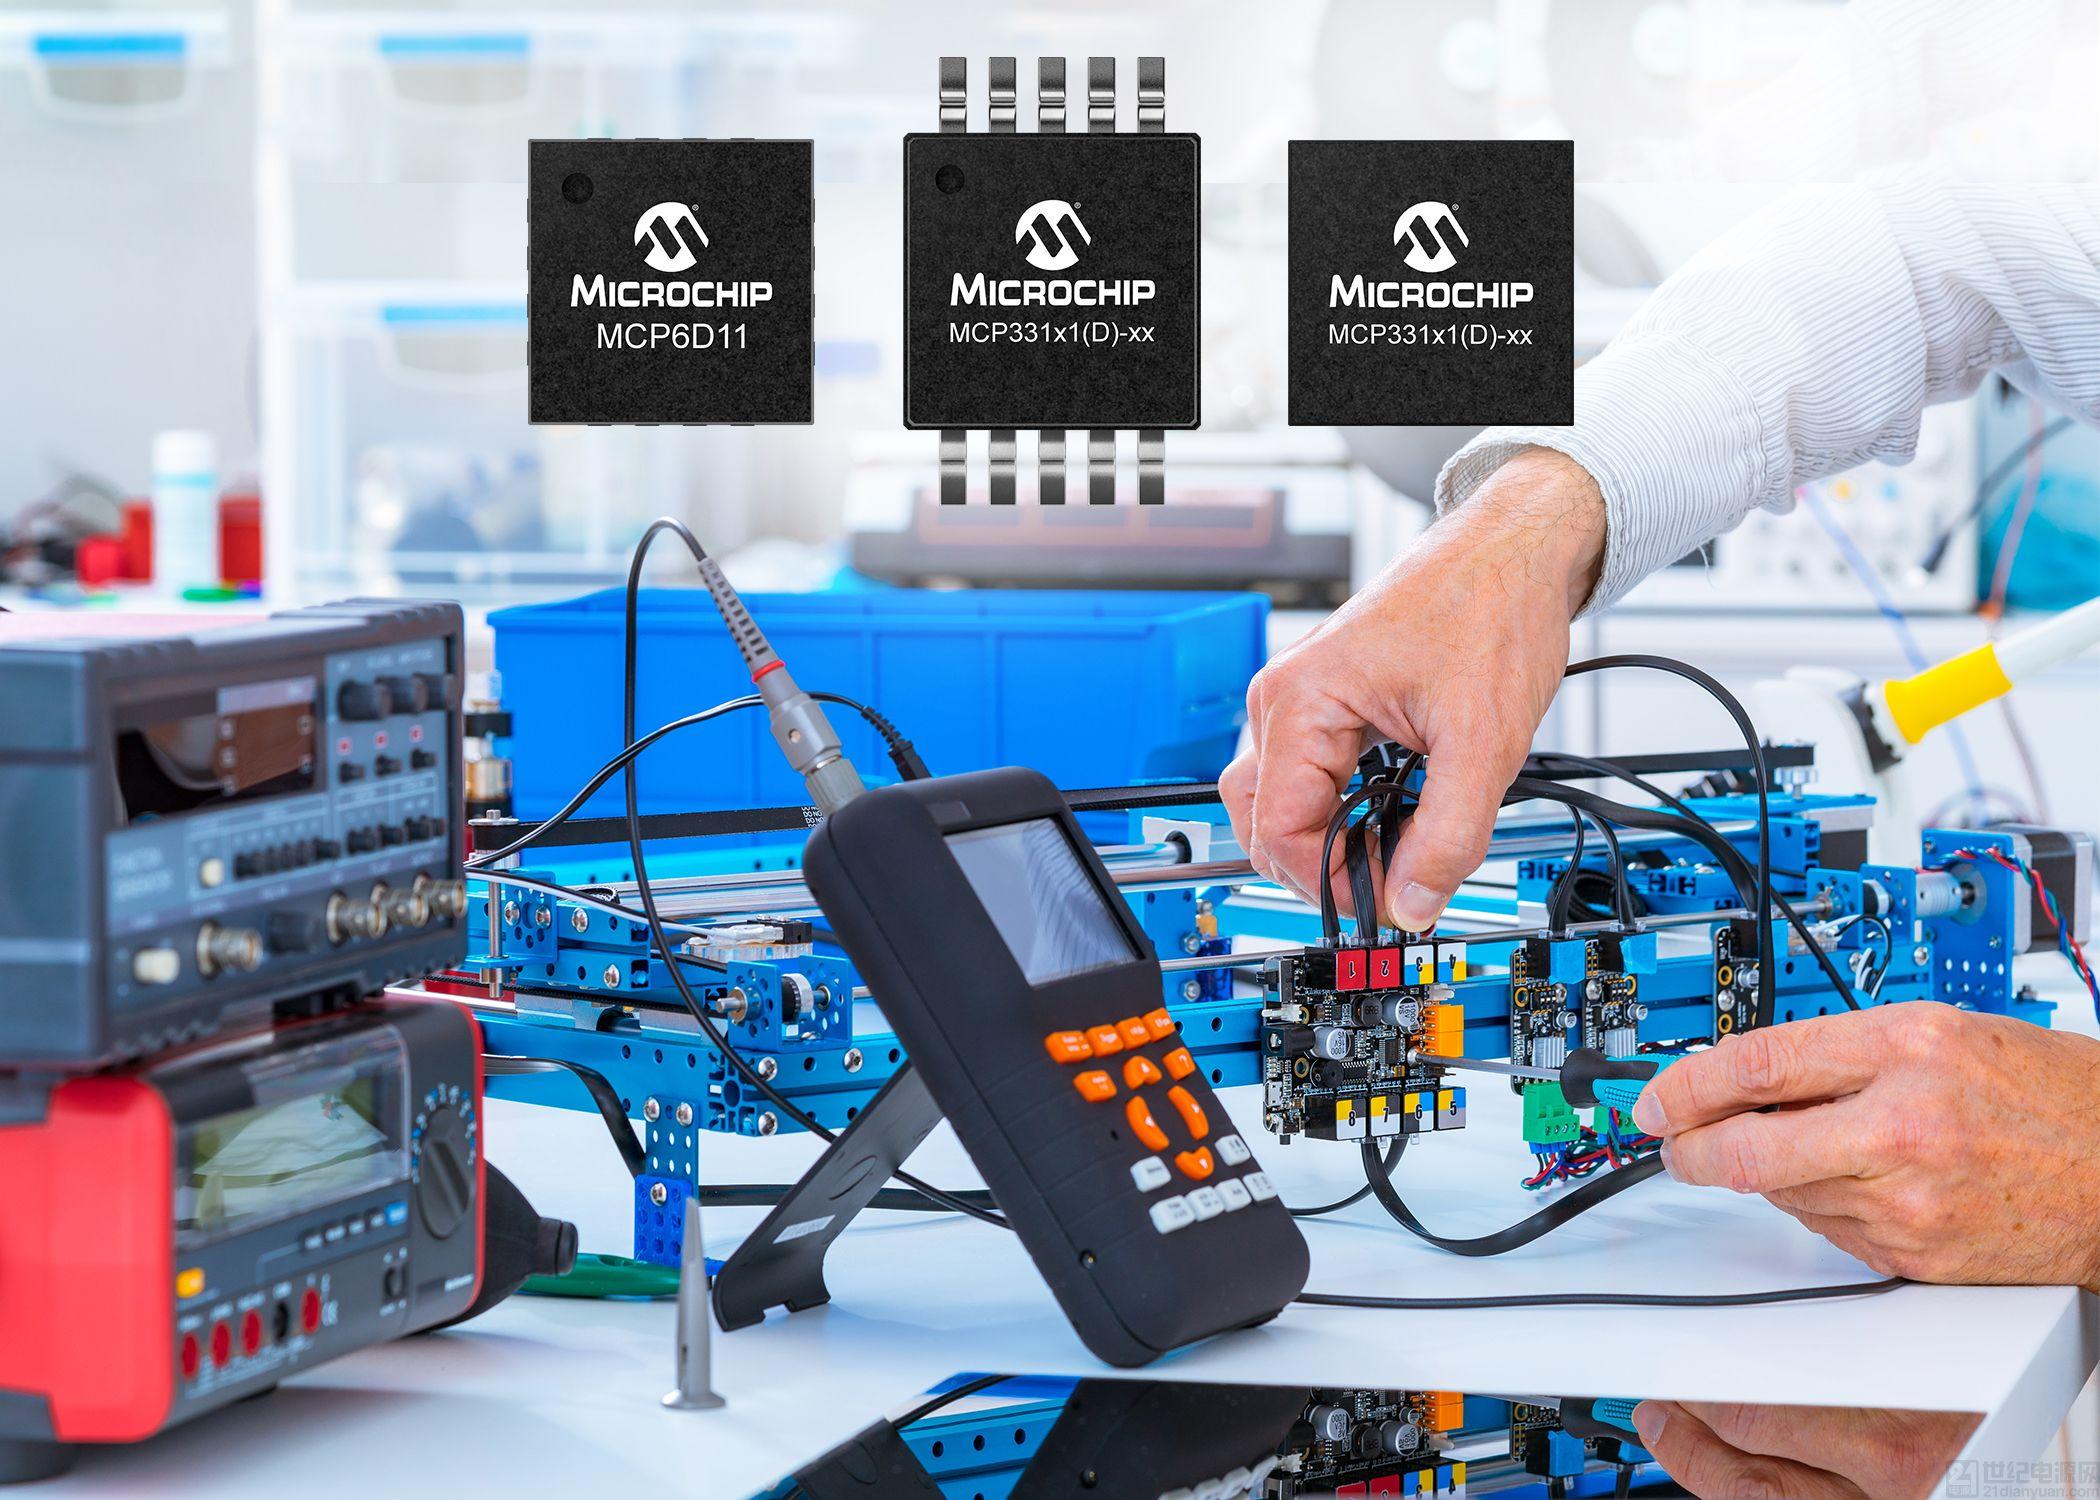 Microchip 推出全新 SAR ADC 系列产品,在恶劣环境中依然可实现高速、高?#30452;?#29575;模数转换